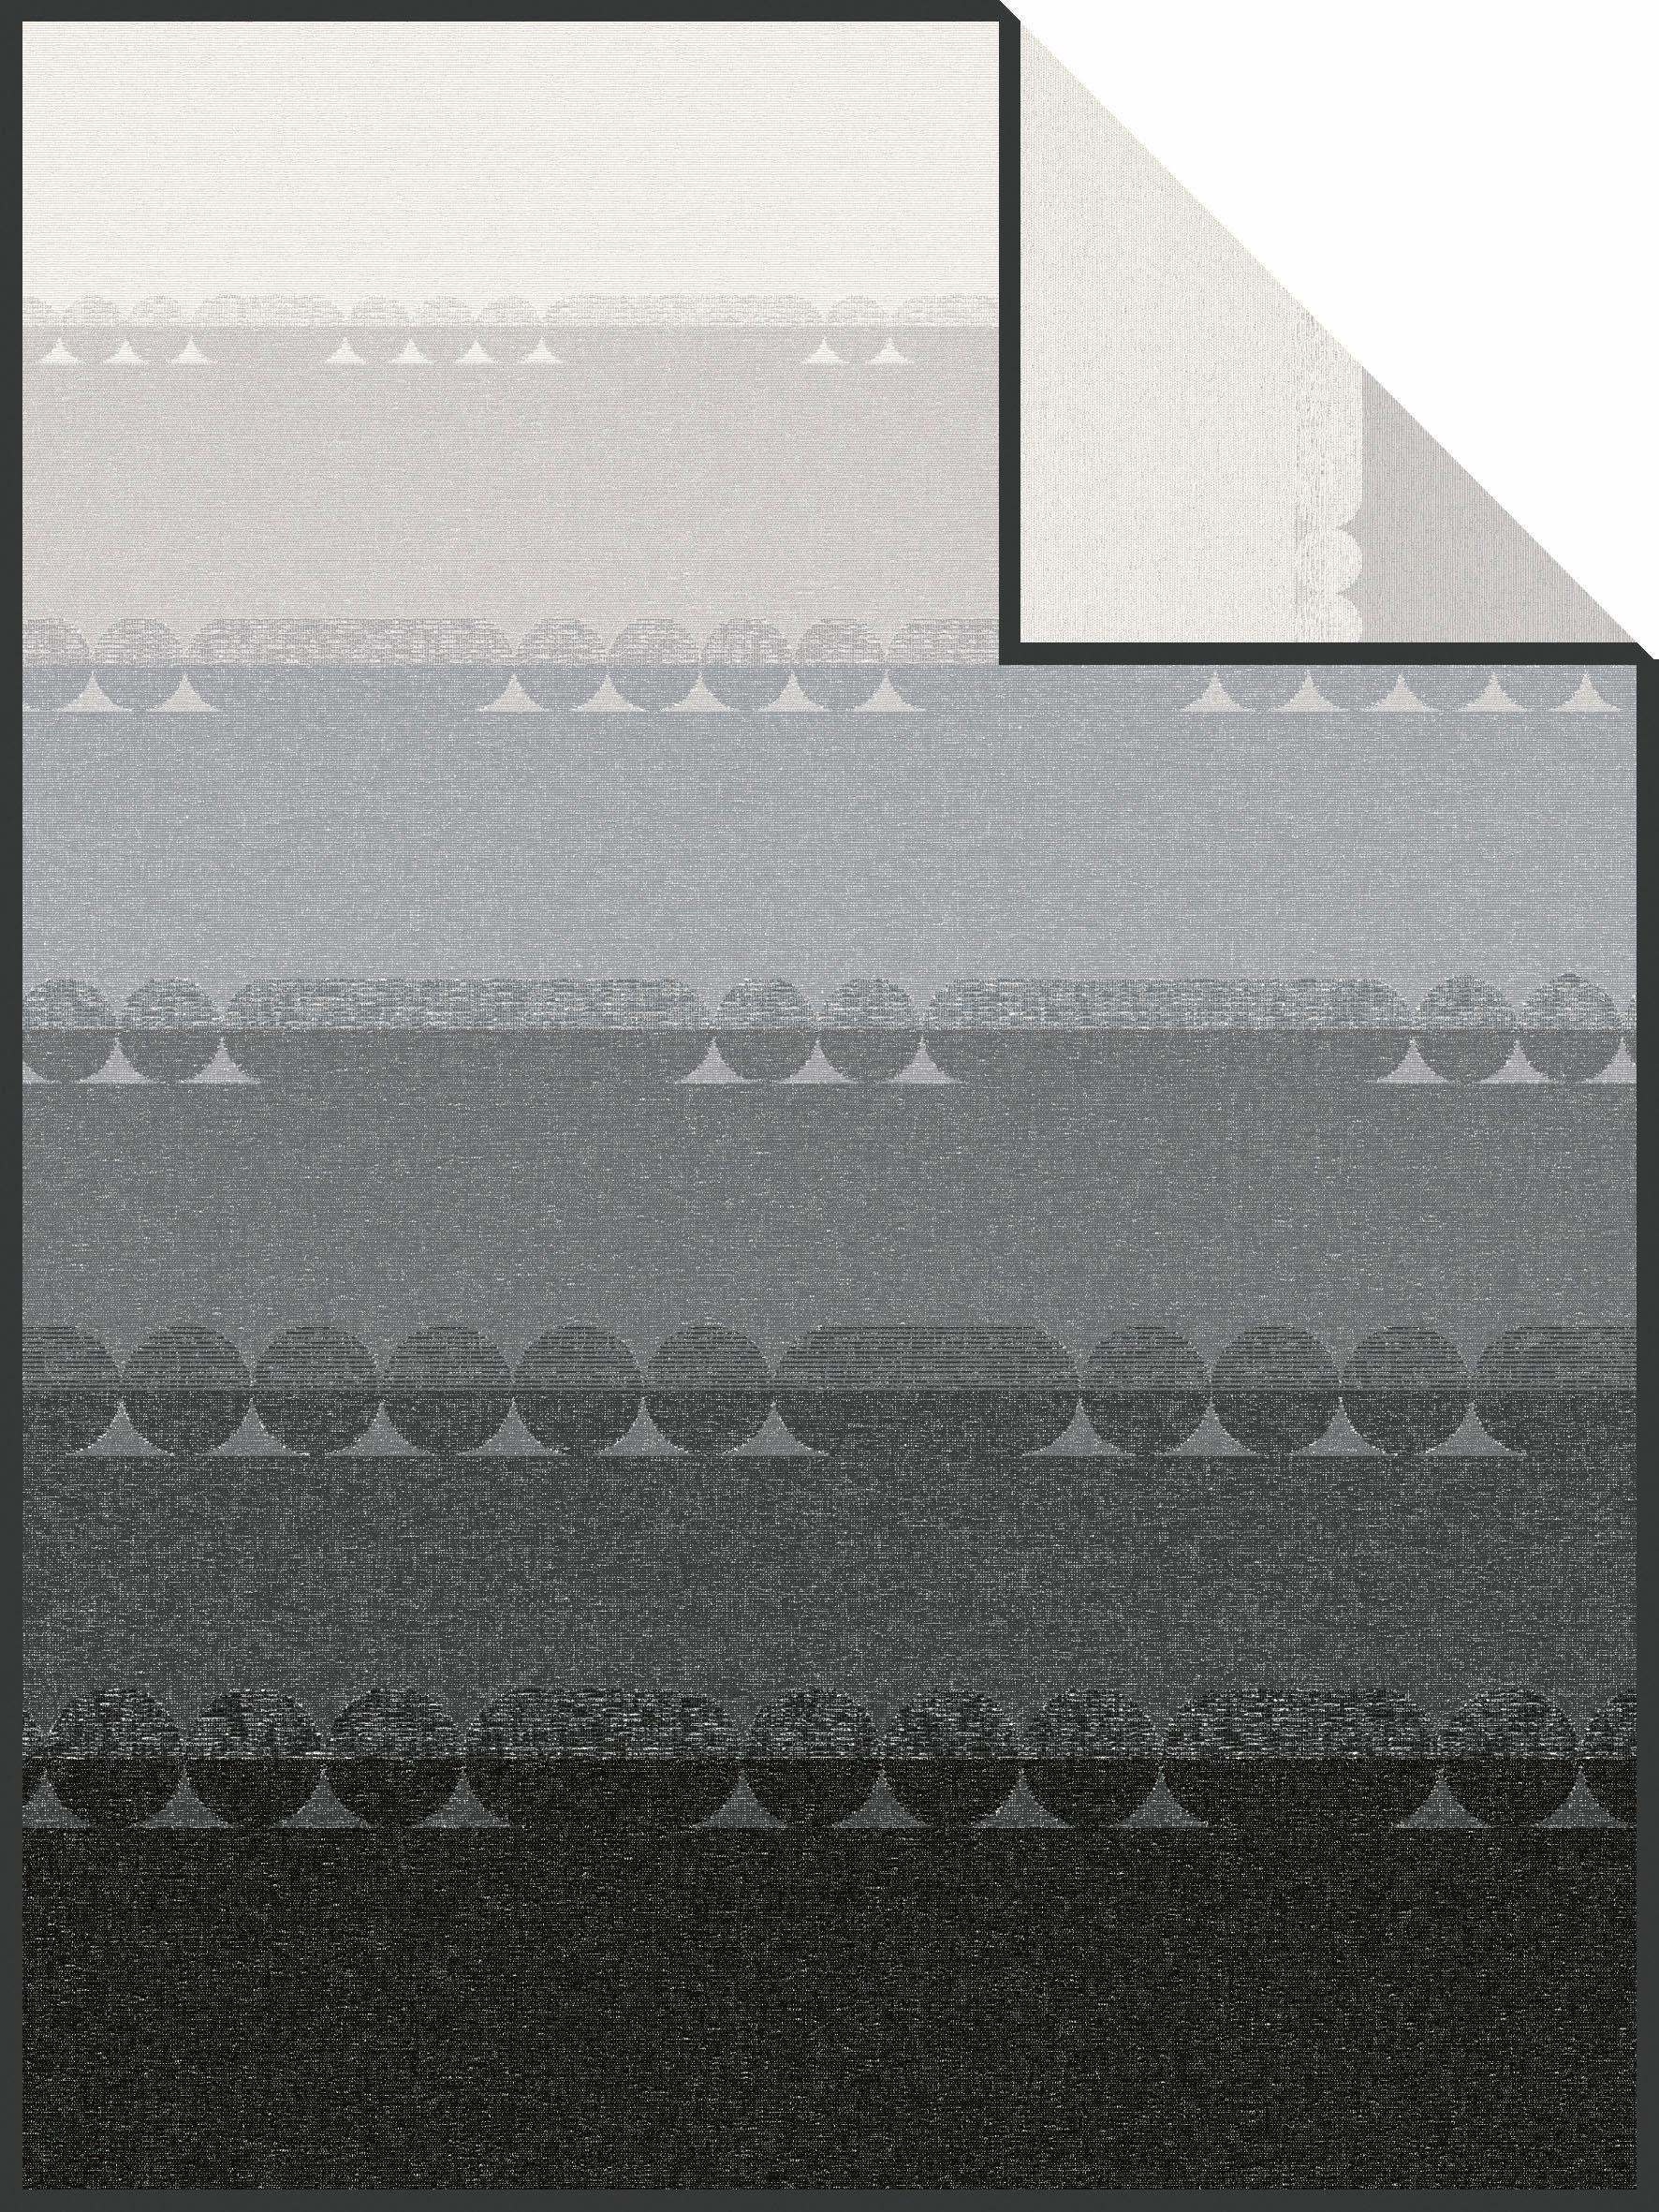 Wohndecke, Ibena, »Kunda«, mit angedeuteten Kreisen